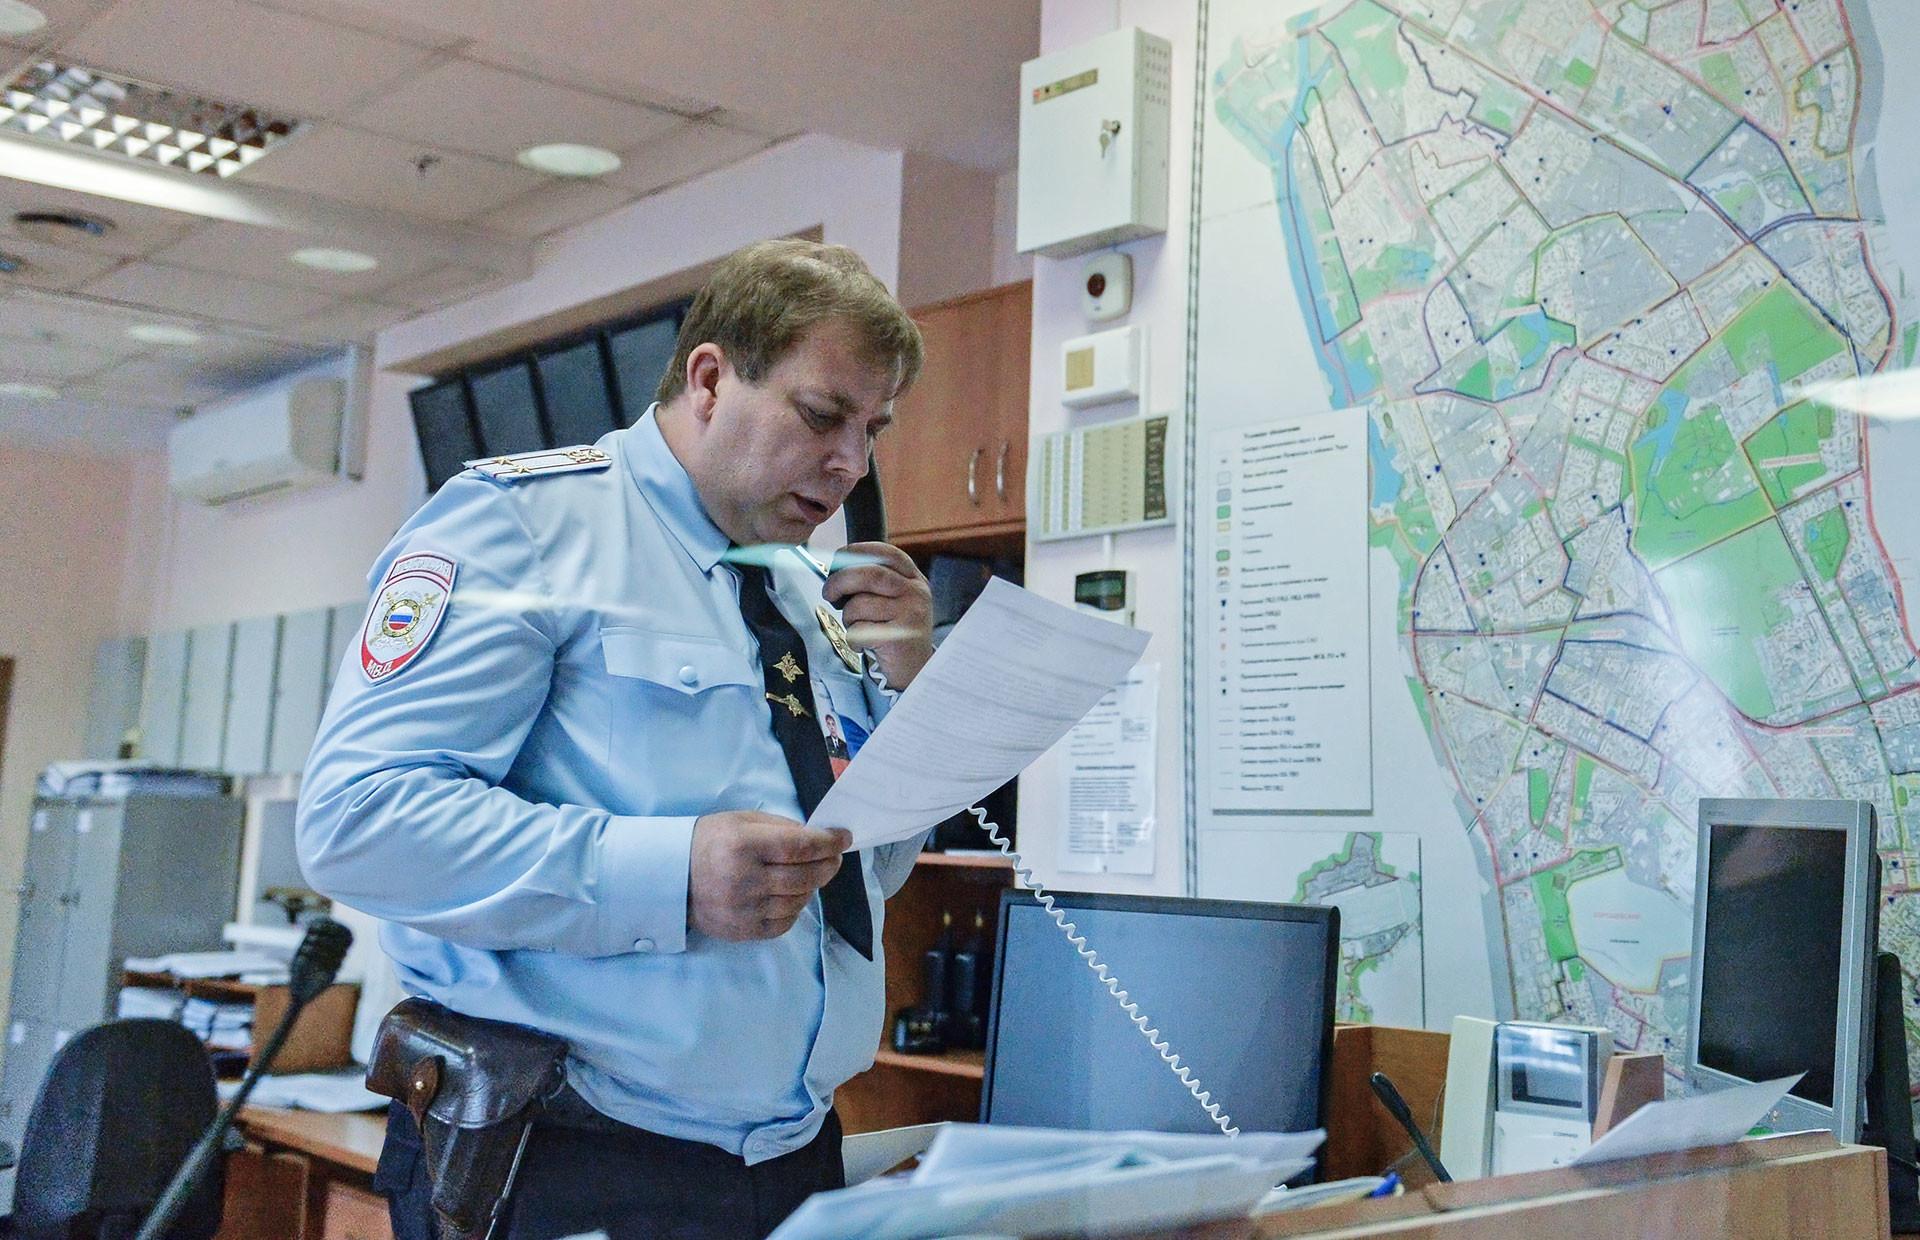 Фото © РИА Новости/Владимир Песня